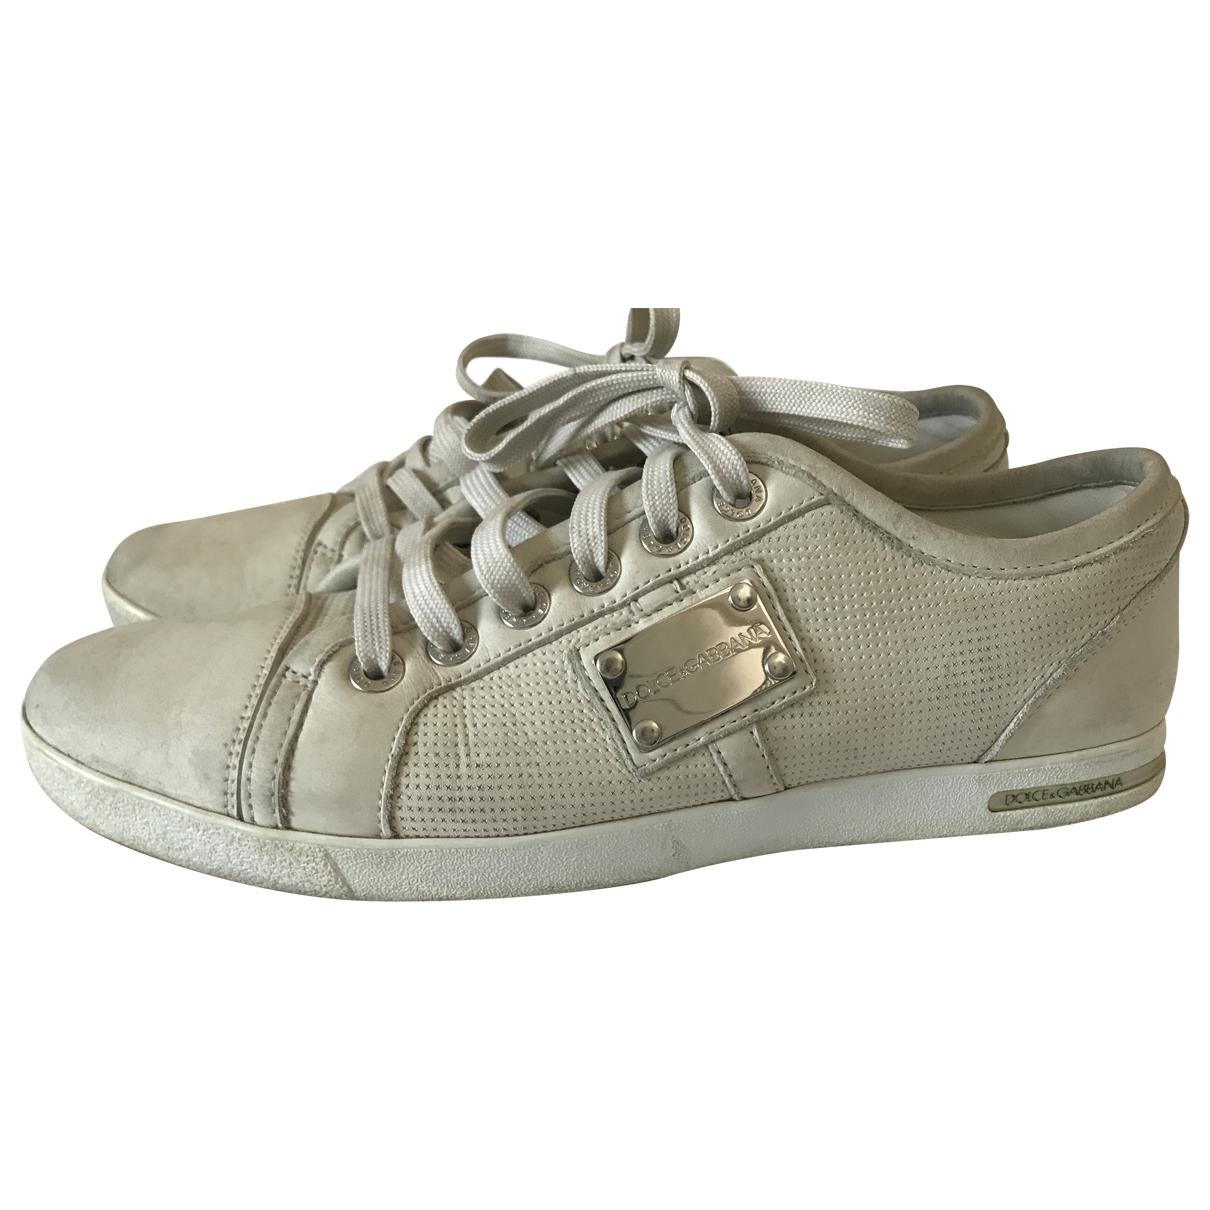 Dolce & Gabbana \N Sneakers in  Ecru Leder